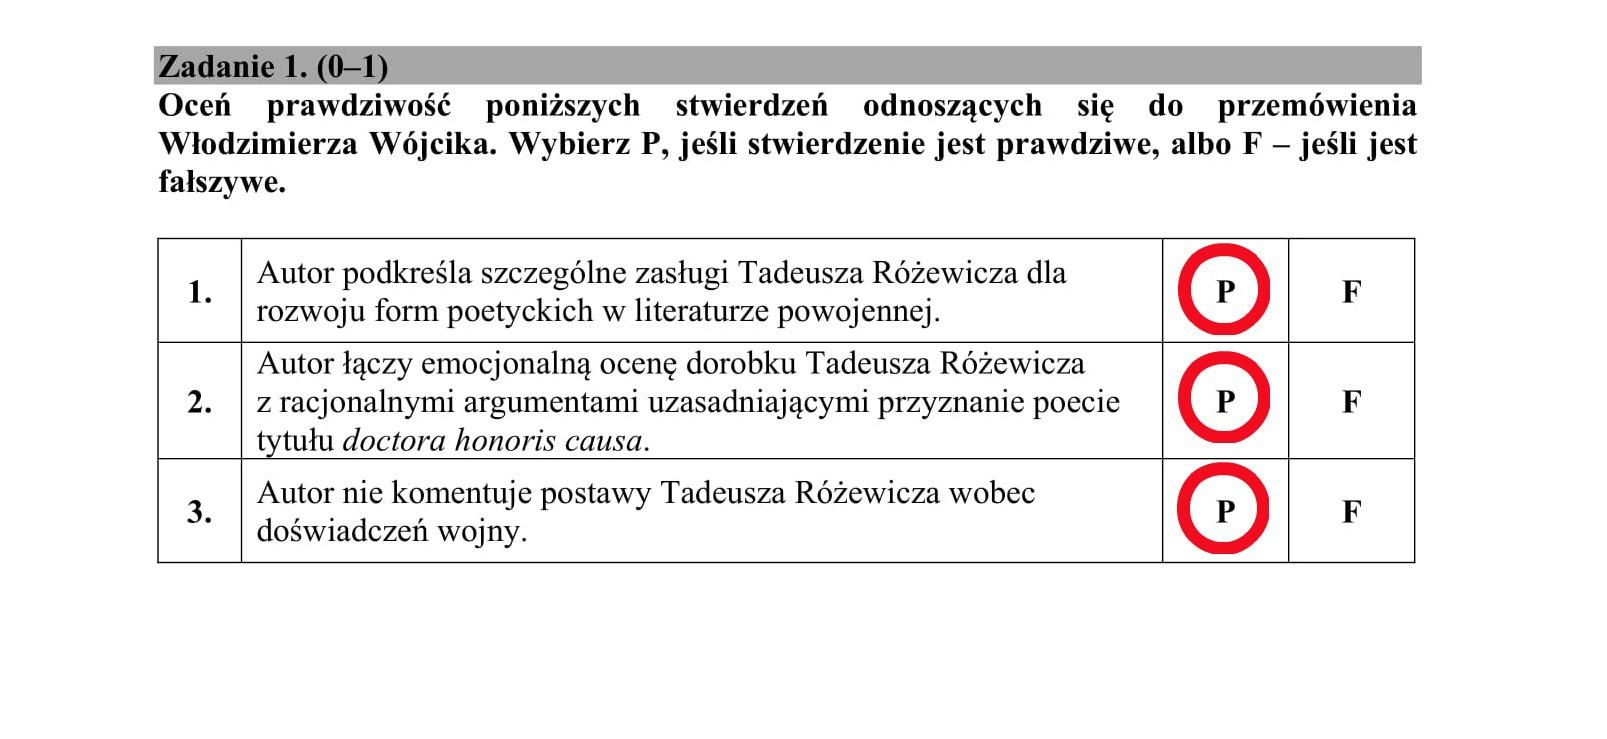 matura próbna nowa era 2018 polski